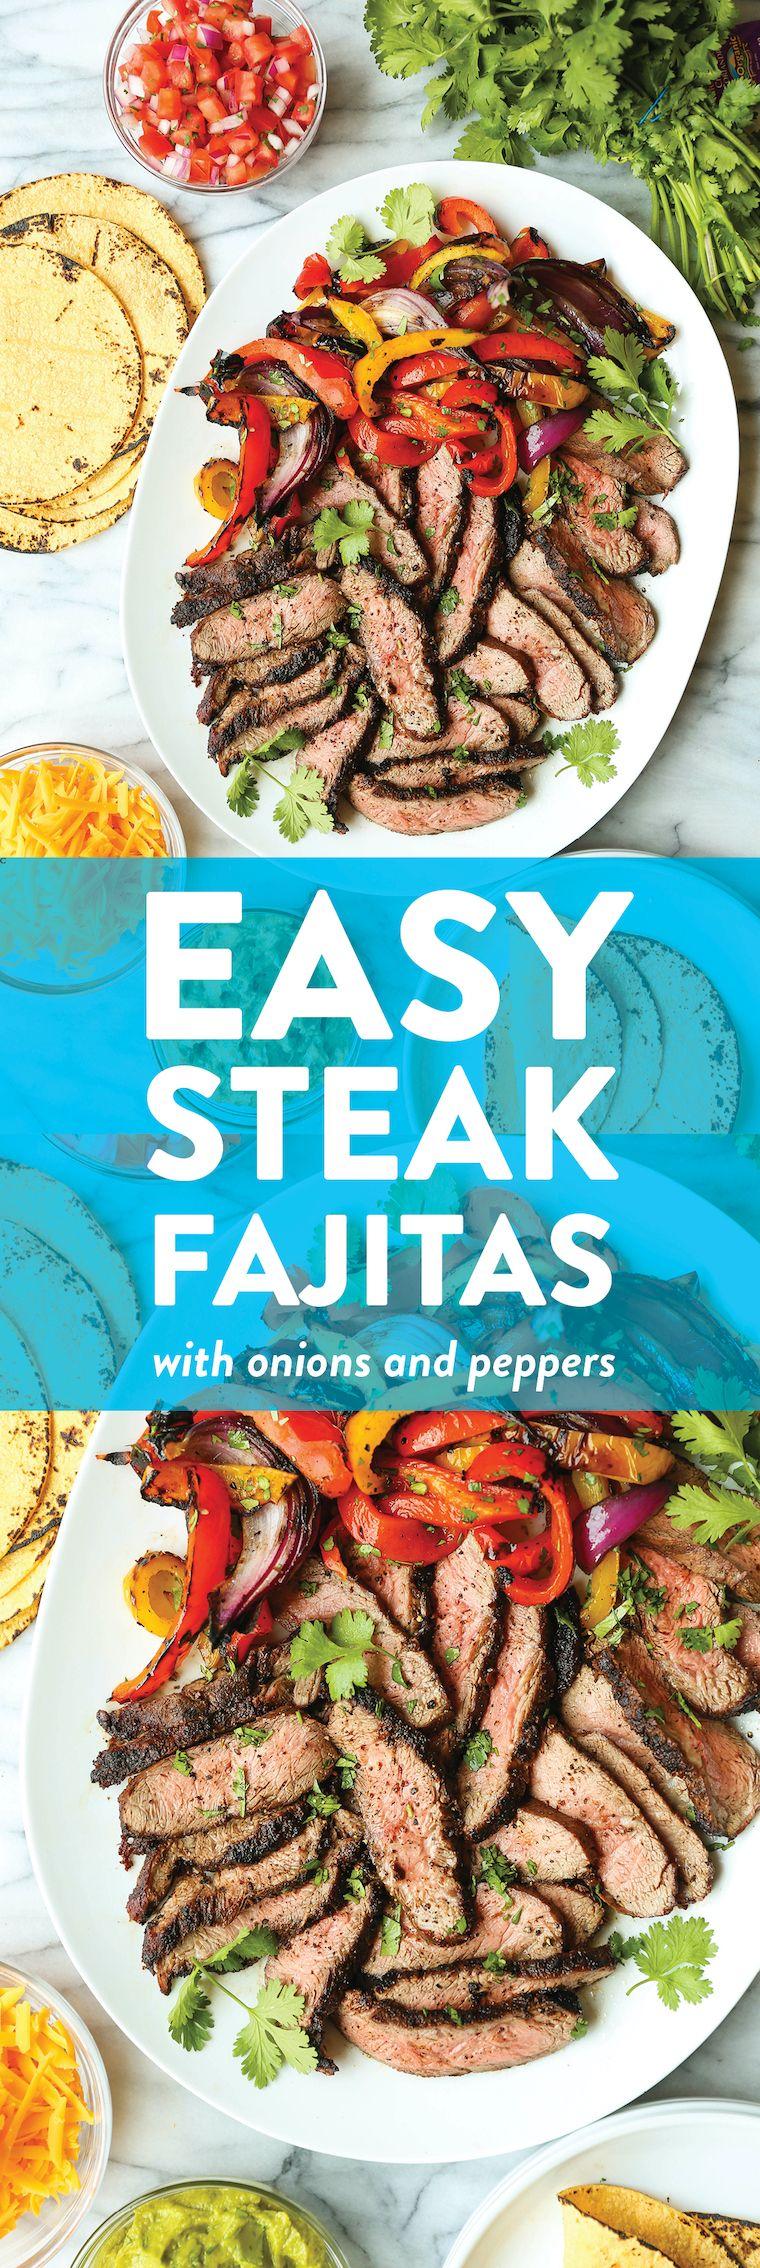 Photo of Easy Steak Fajitas